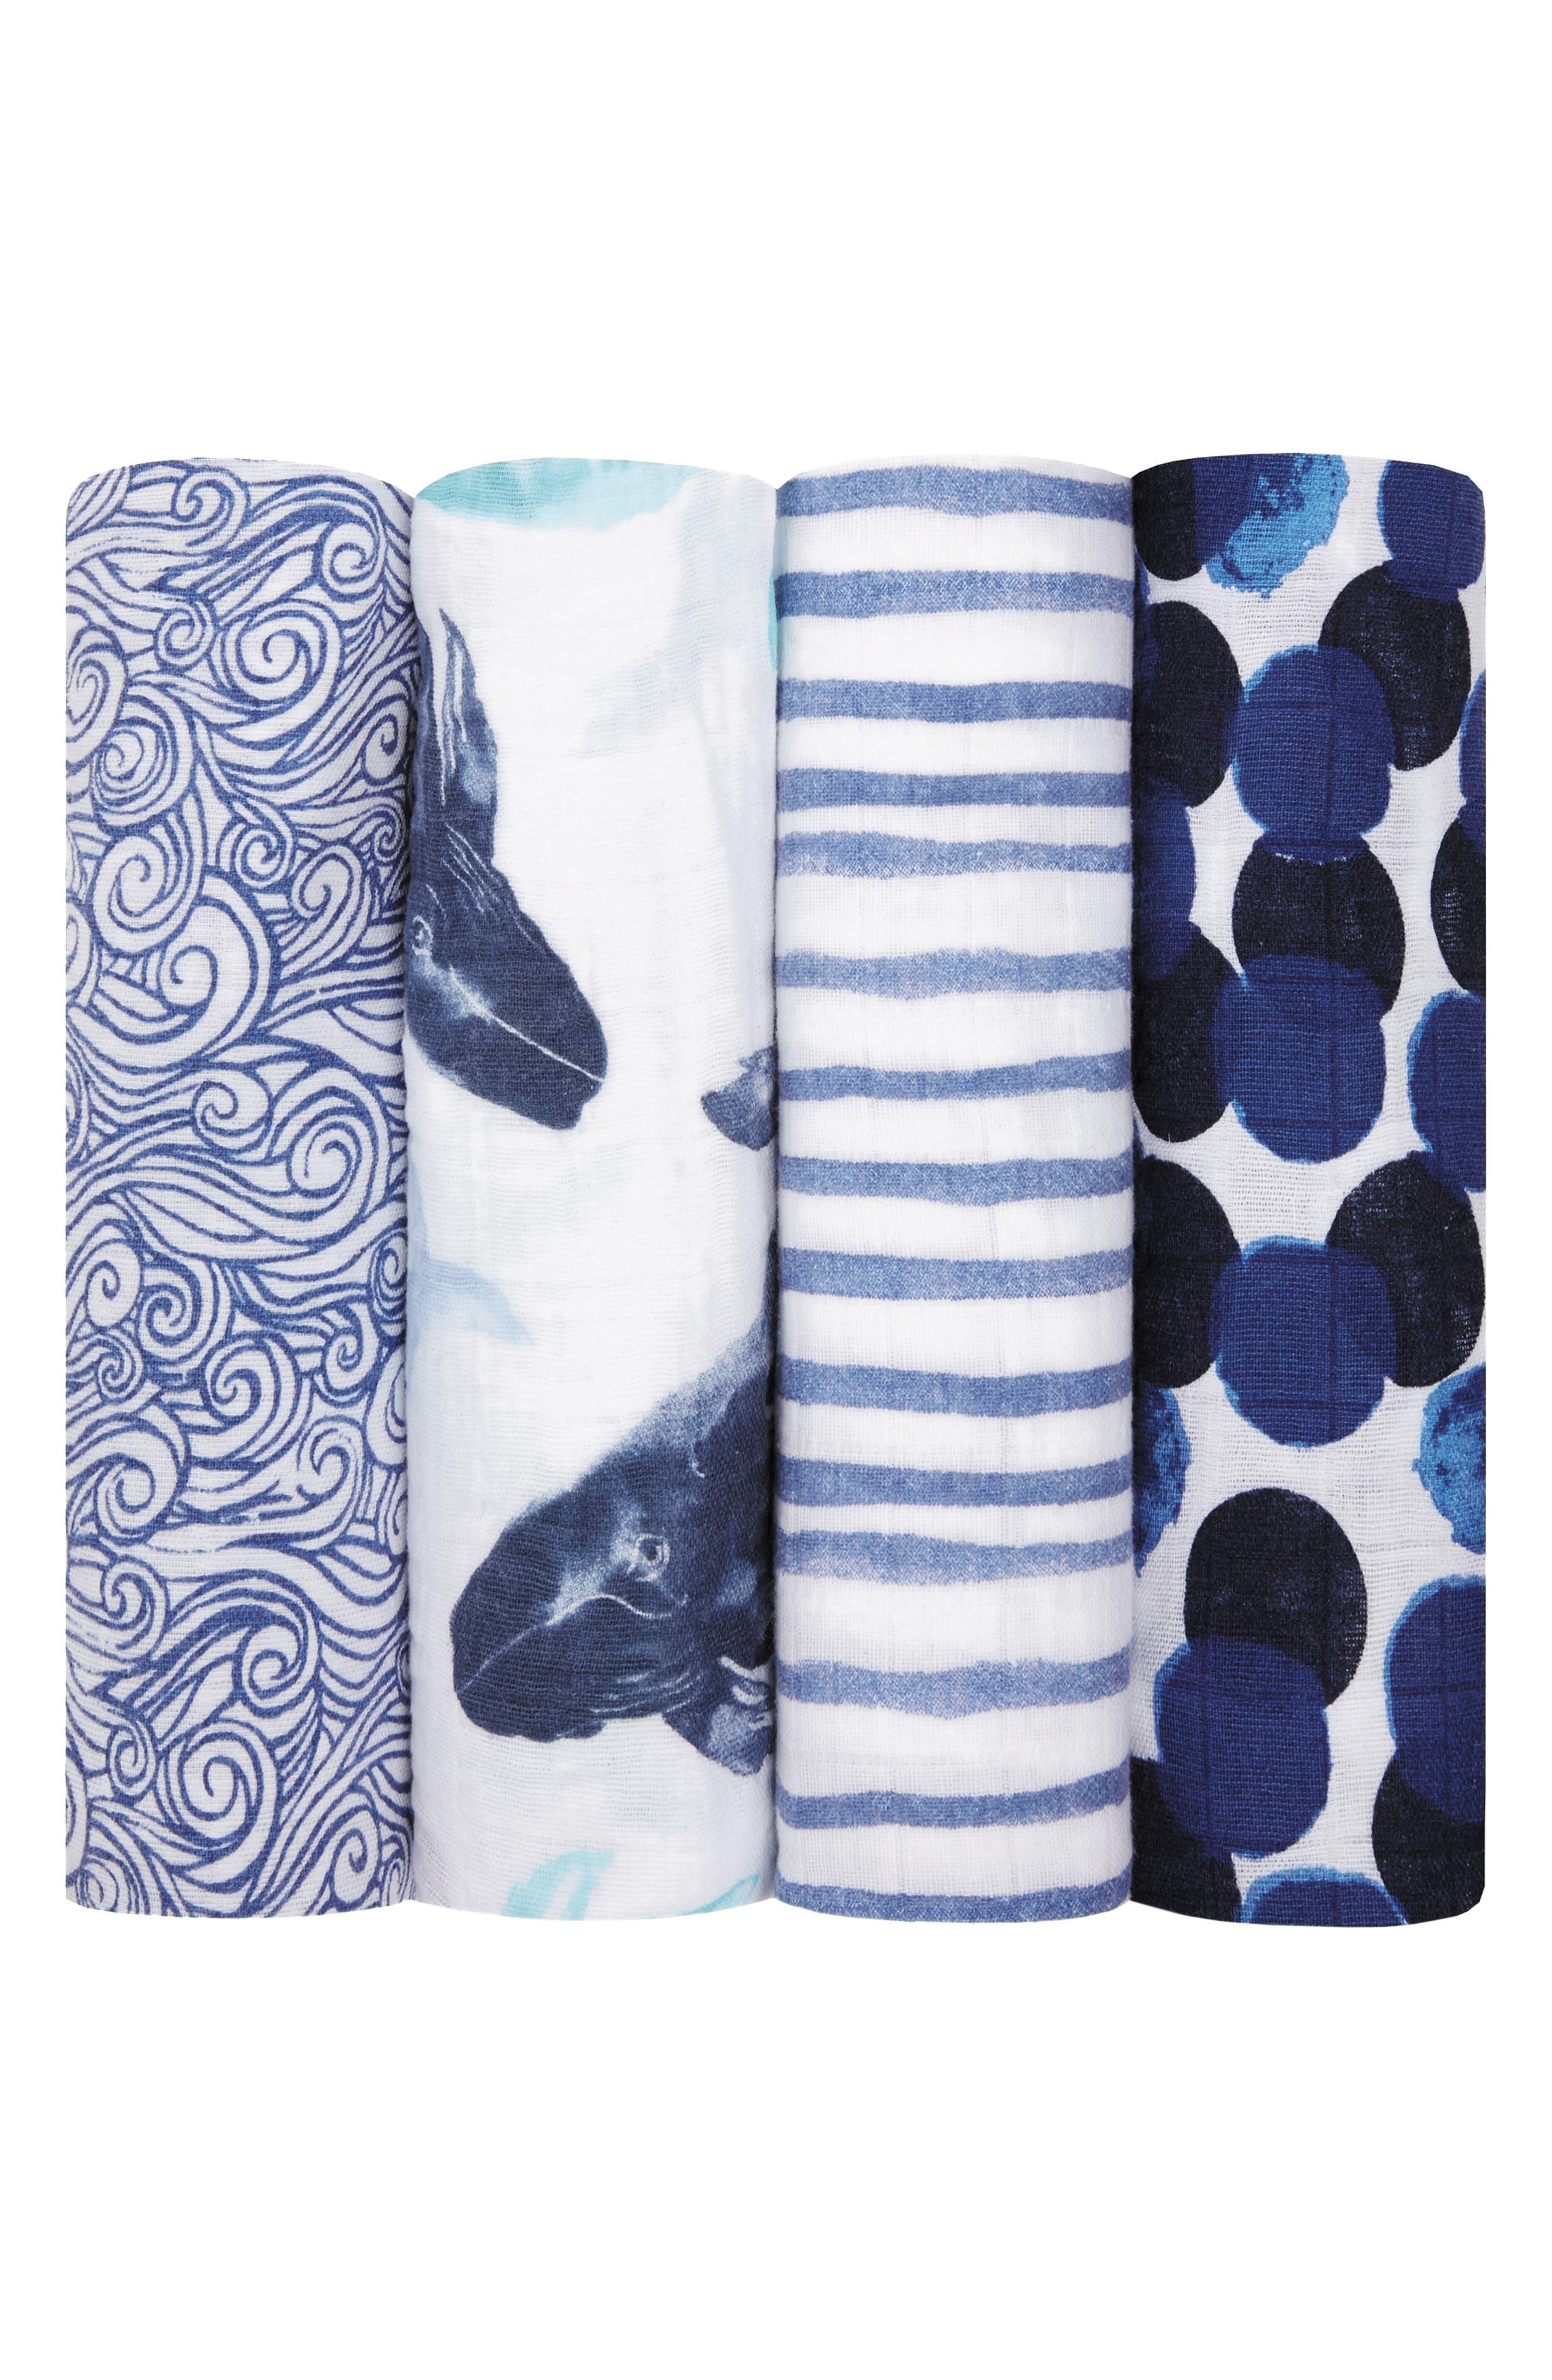 Set of 4 Classic Swaddling Cloths,                             Main thumbnail 1, color,                             SEAFARING